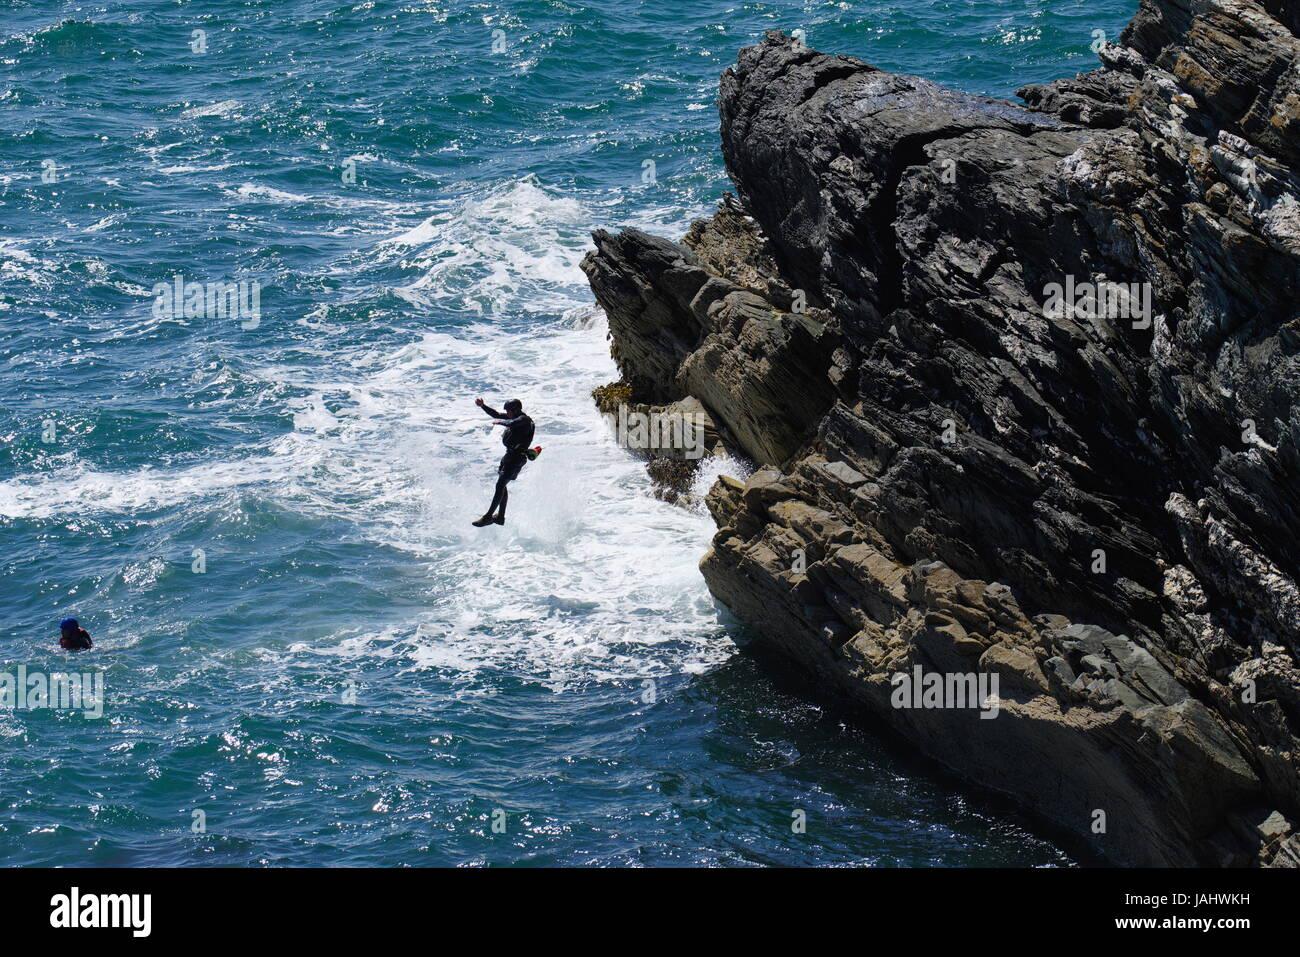 Coasteering, Porth Dafarch - Stock Image